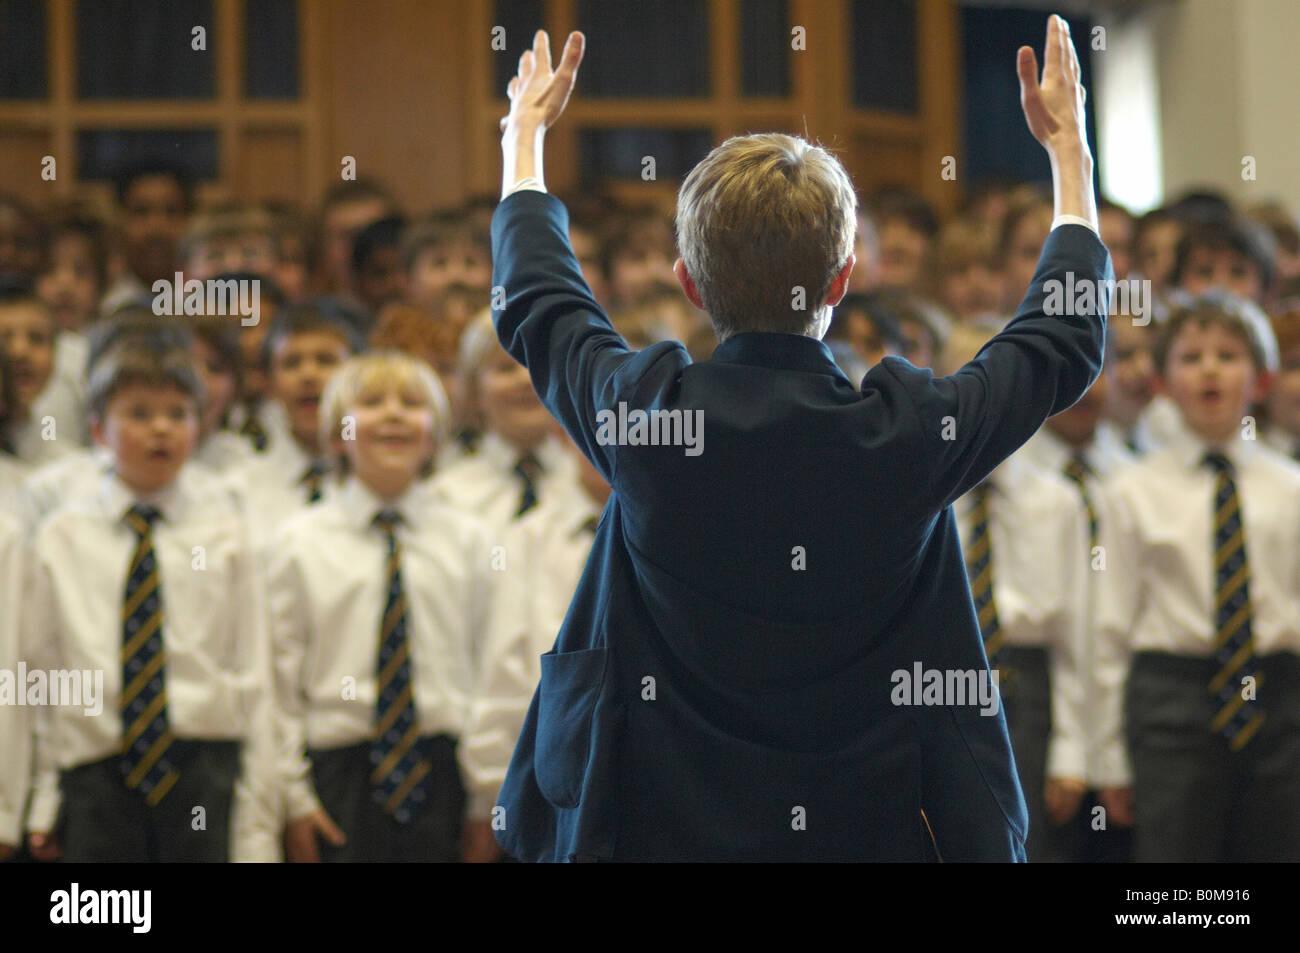 concert - Stock Image